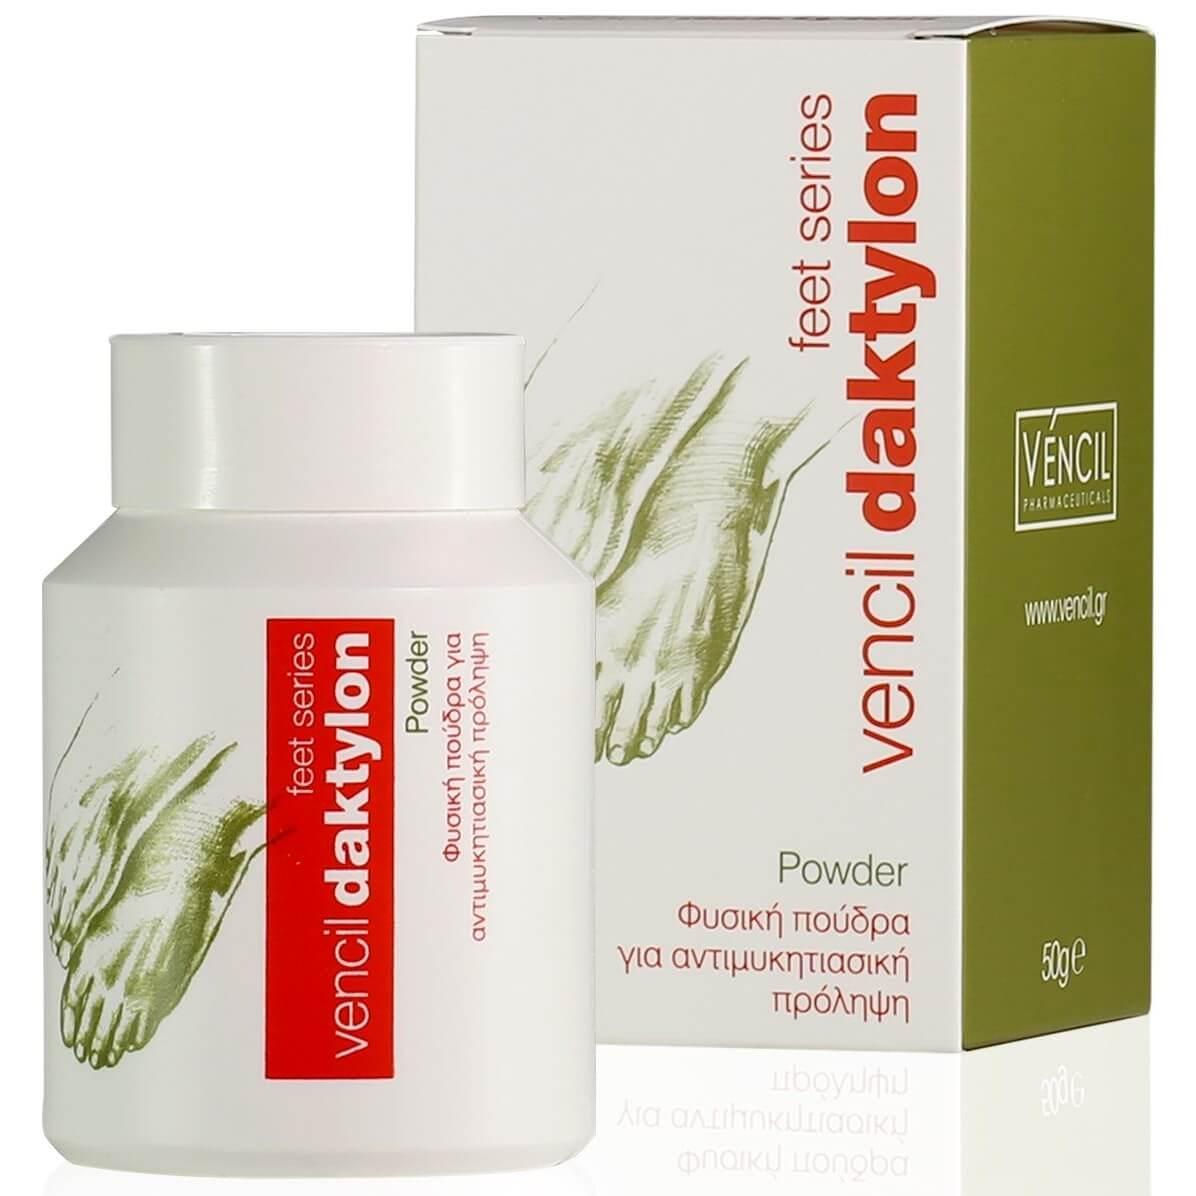 Vencil Daktylon Powder Φυσική Πούδρα για Αντιμυκητιασική Πρόληψη με Αντιφλογιστική, Αποσμητική &Απορροφητική Δράση 50g